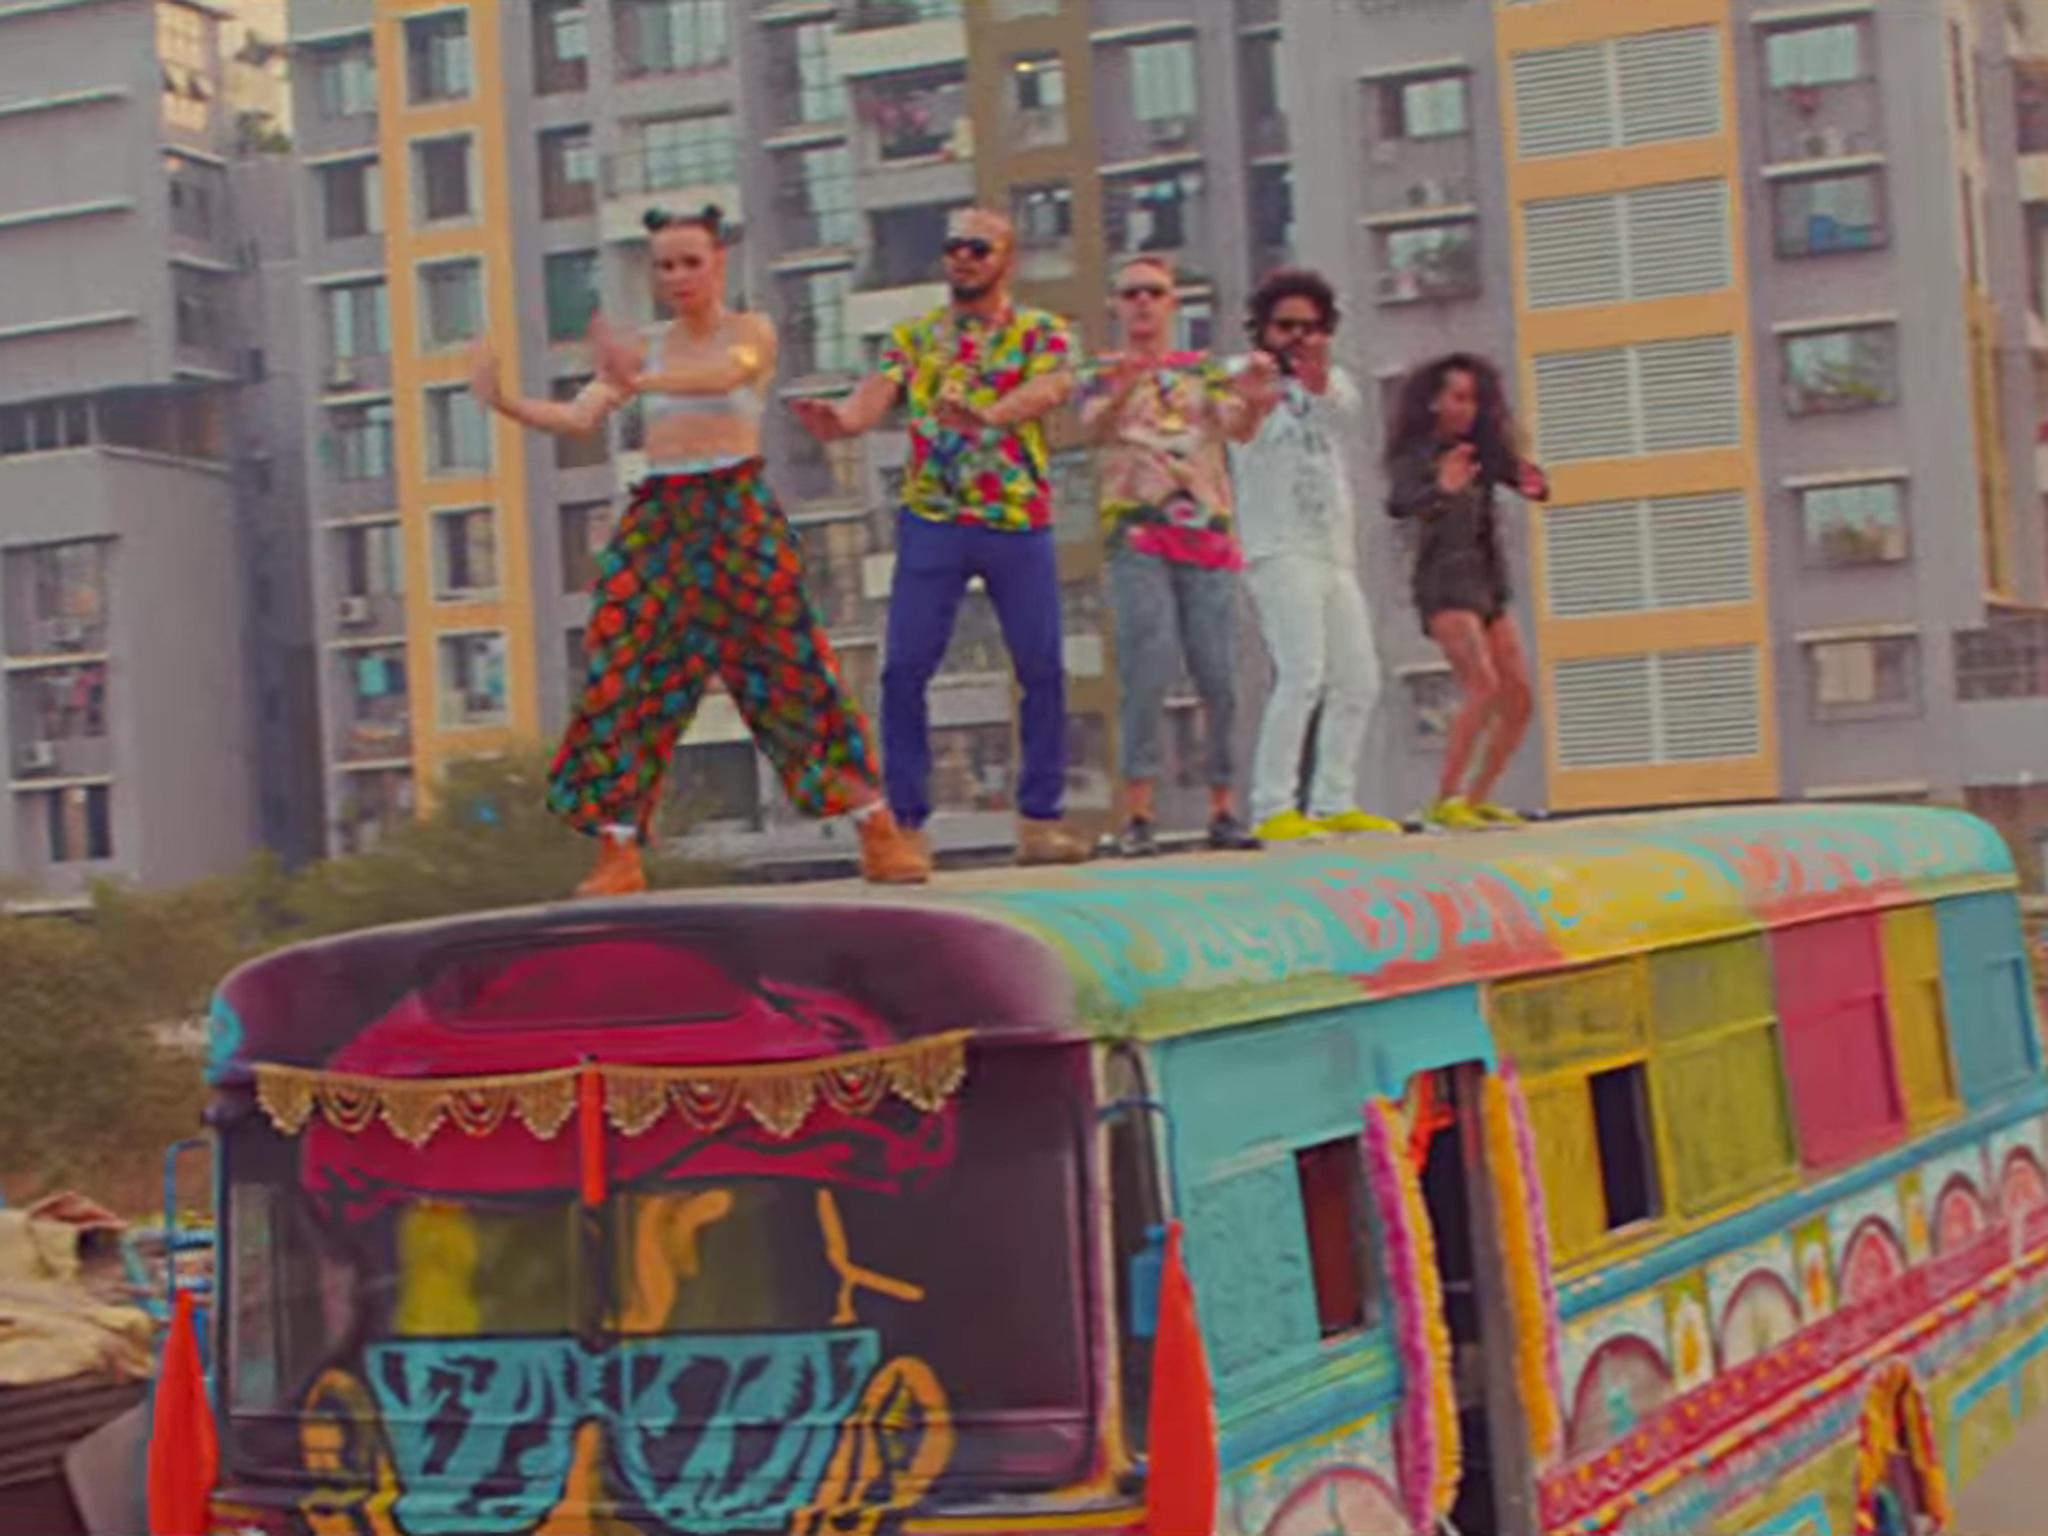 Major Lazer + DJ Snake feat. MØ